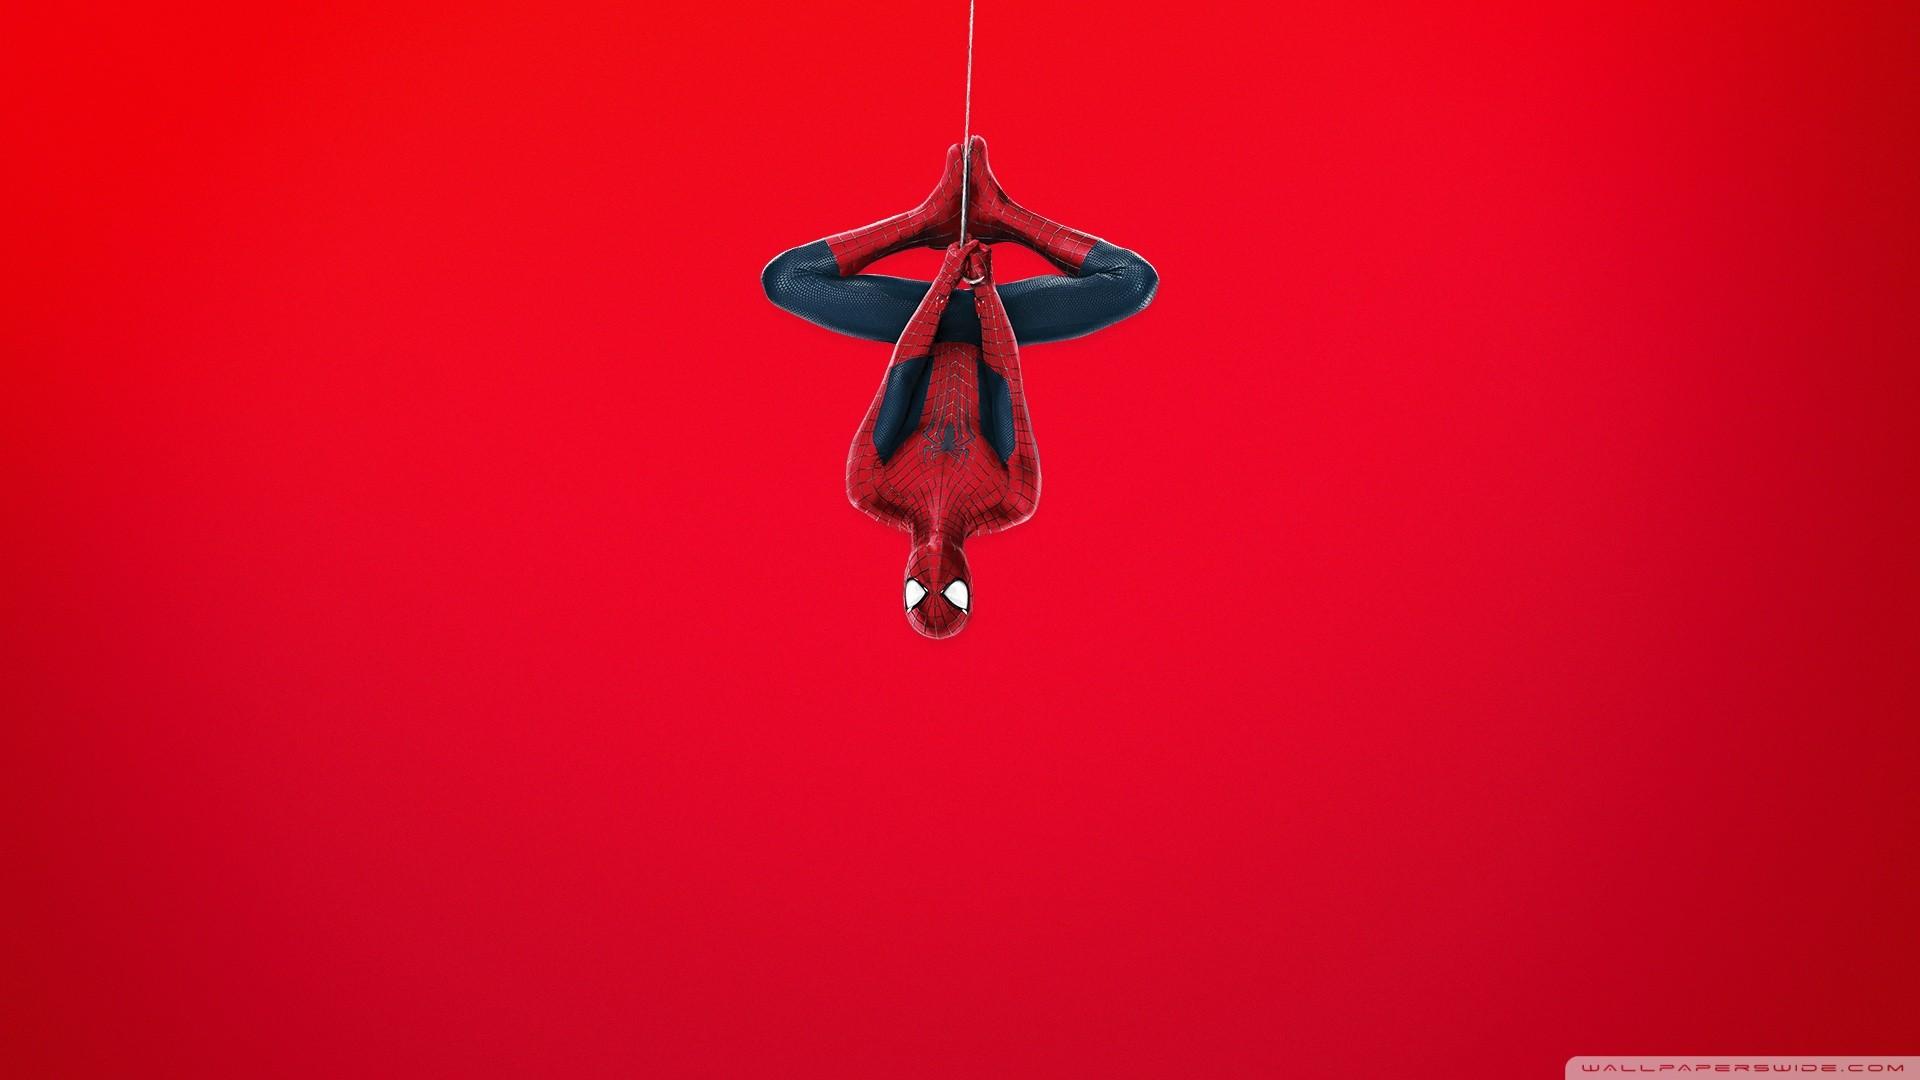 HD desktop wallpaper Spider man 1920 × 1080 . https://nirhara.com/   Spider  man Wallpaper- HD Desktop Background   Pinterest   Spiderman, Amazing  spider and …